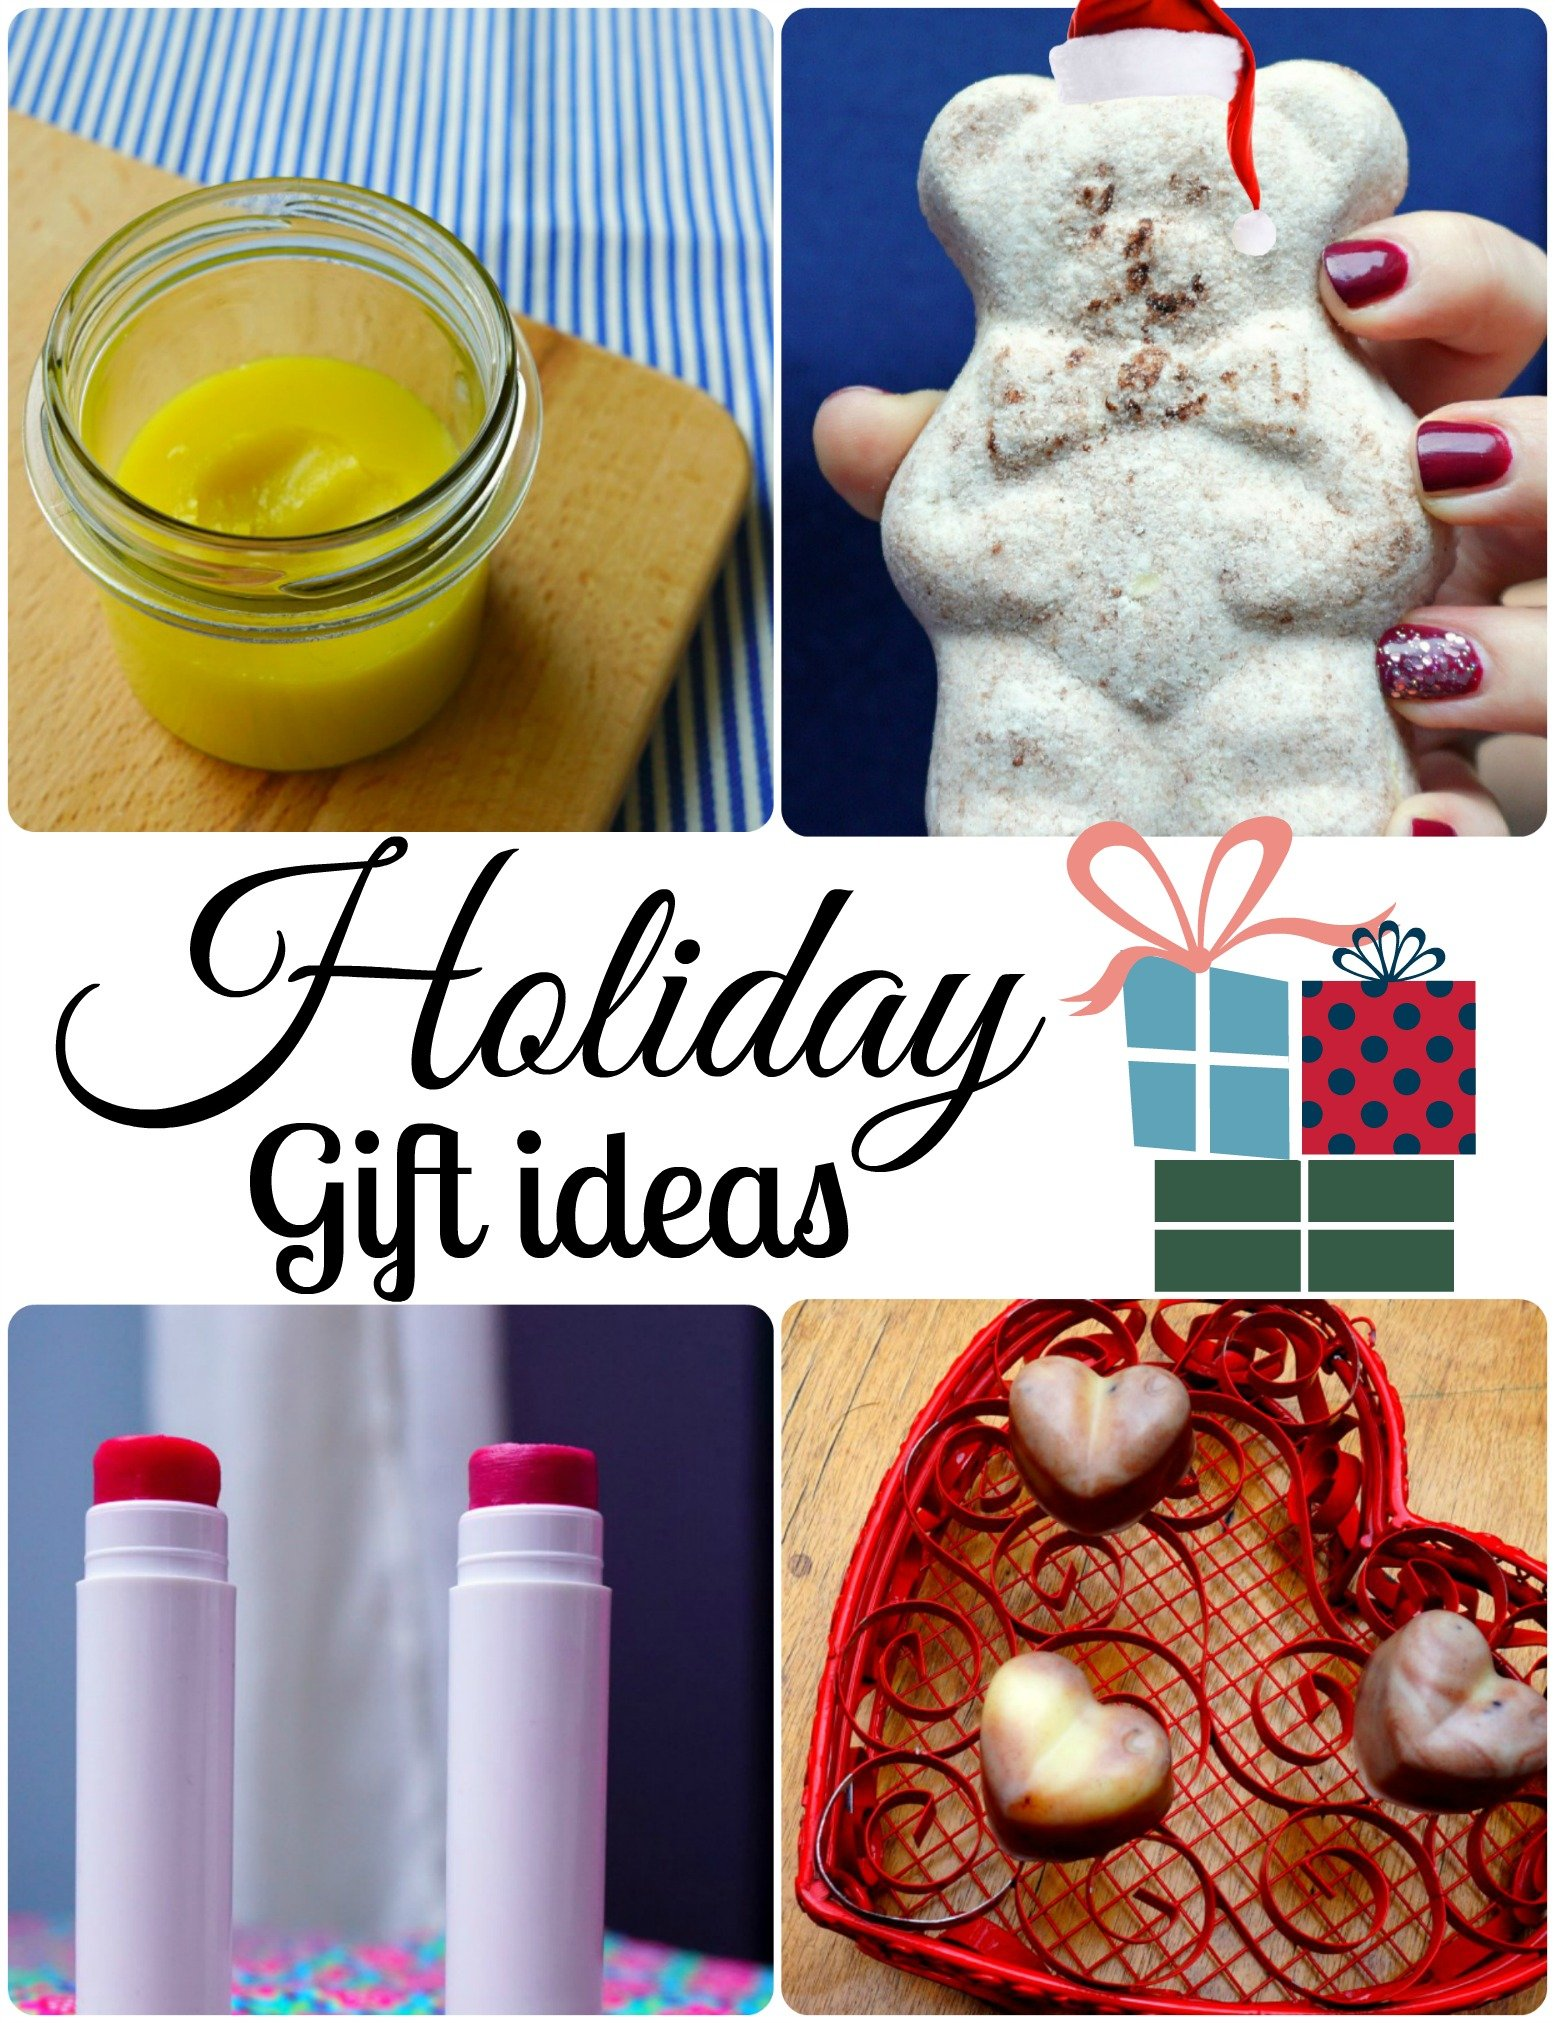 Easy DIY Holiday gift ideas (aka great stocking stuffers!)